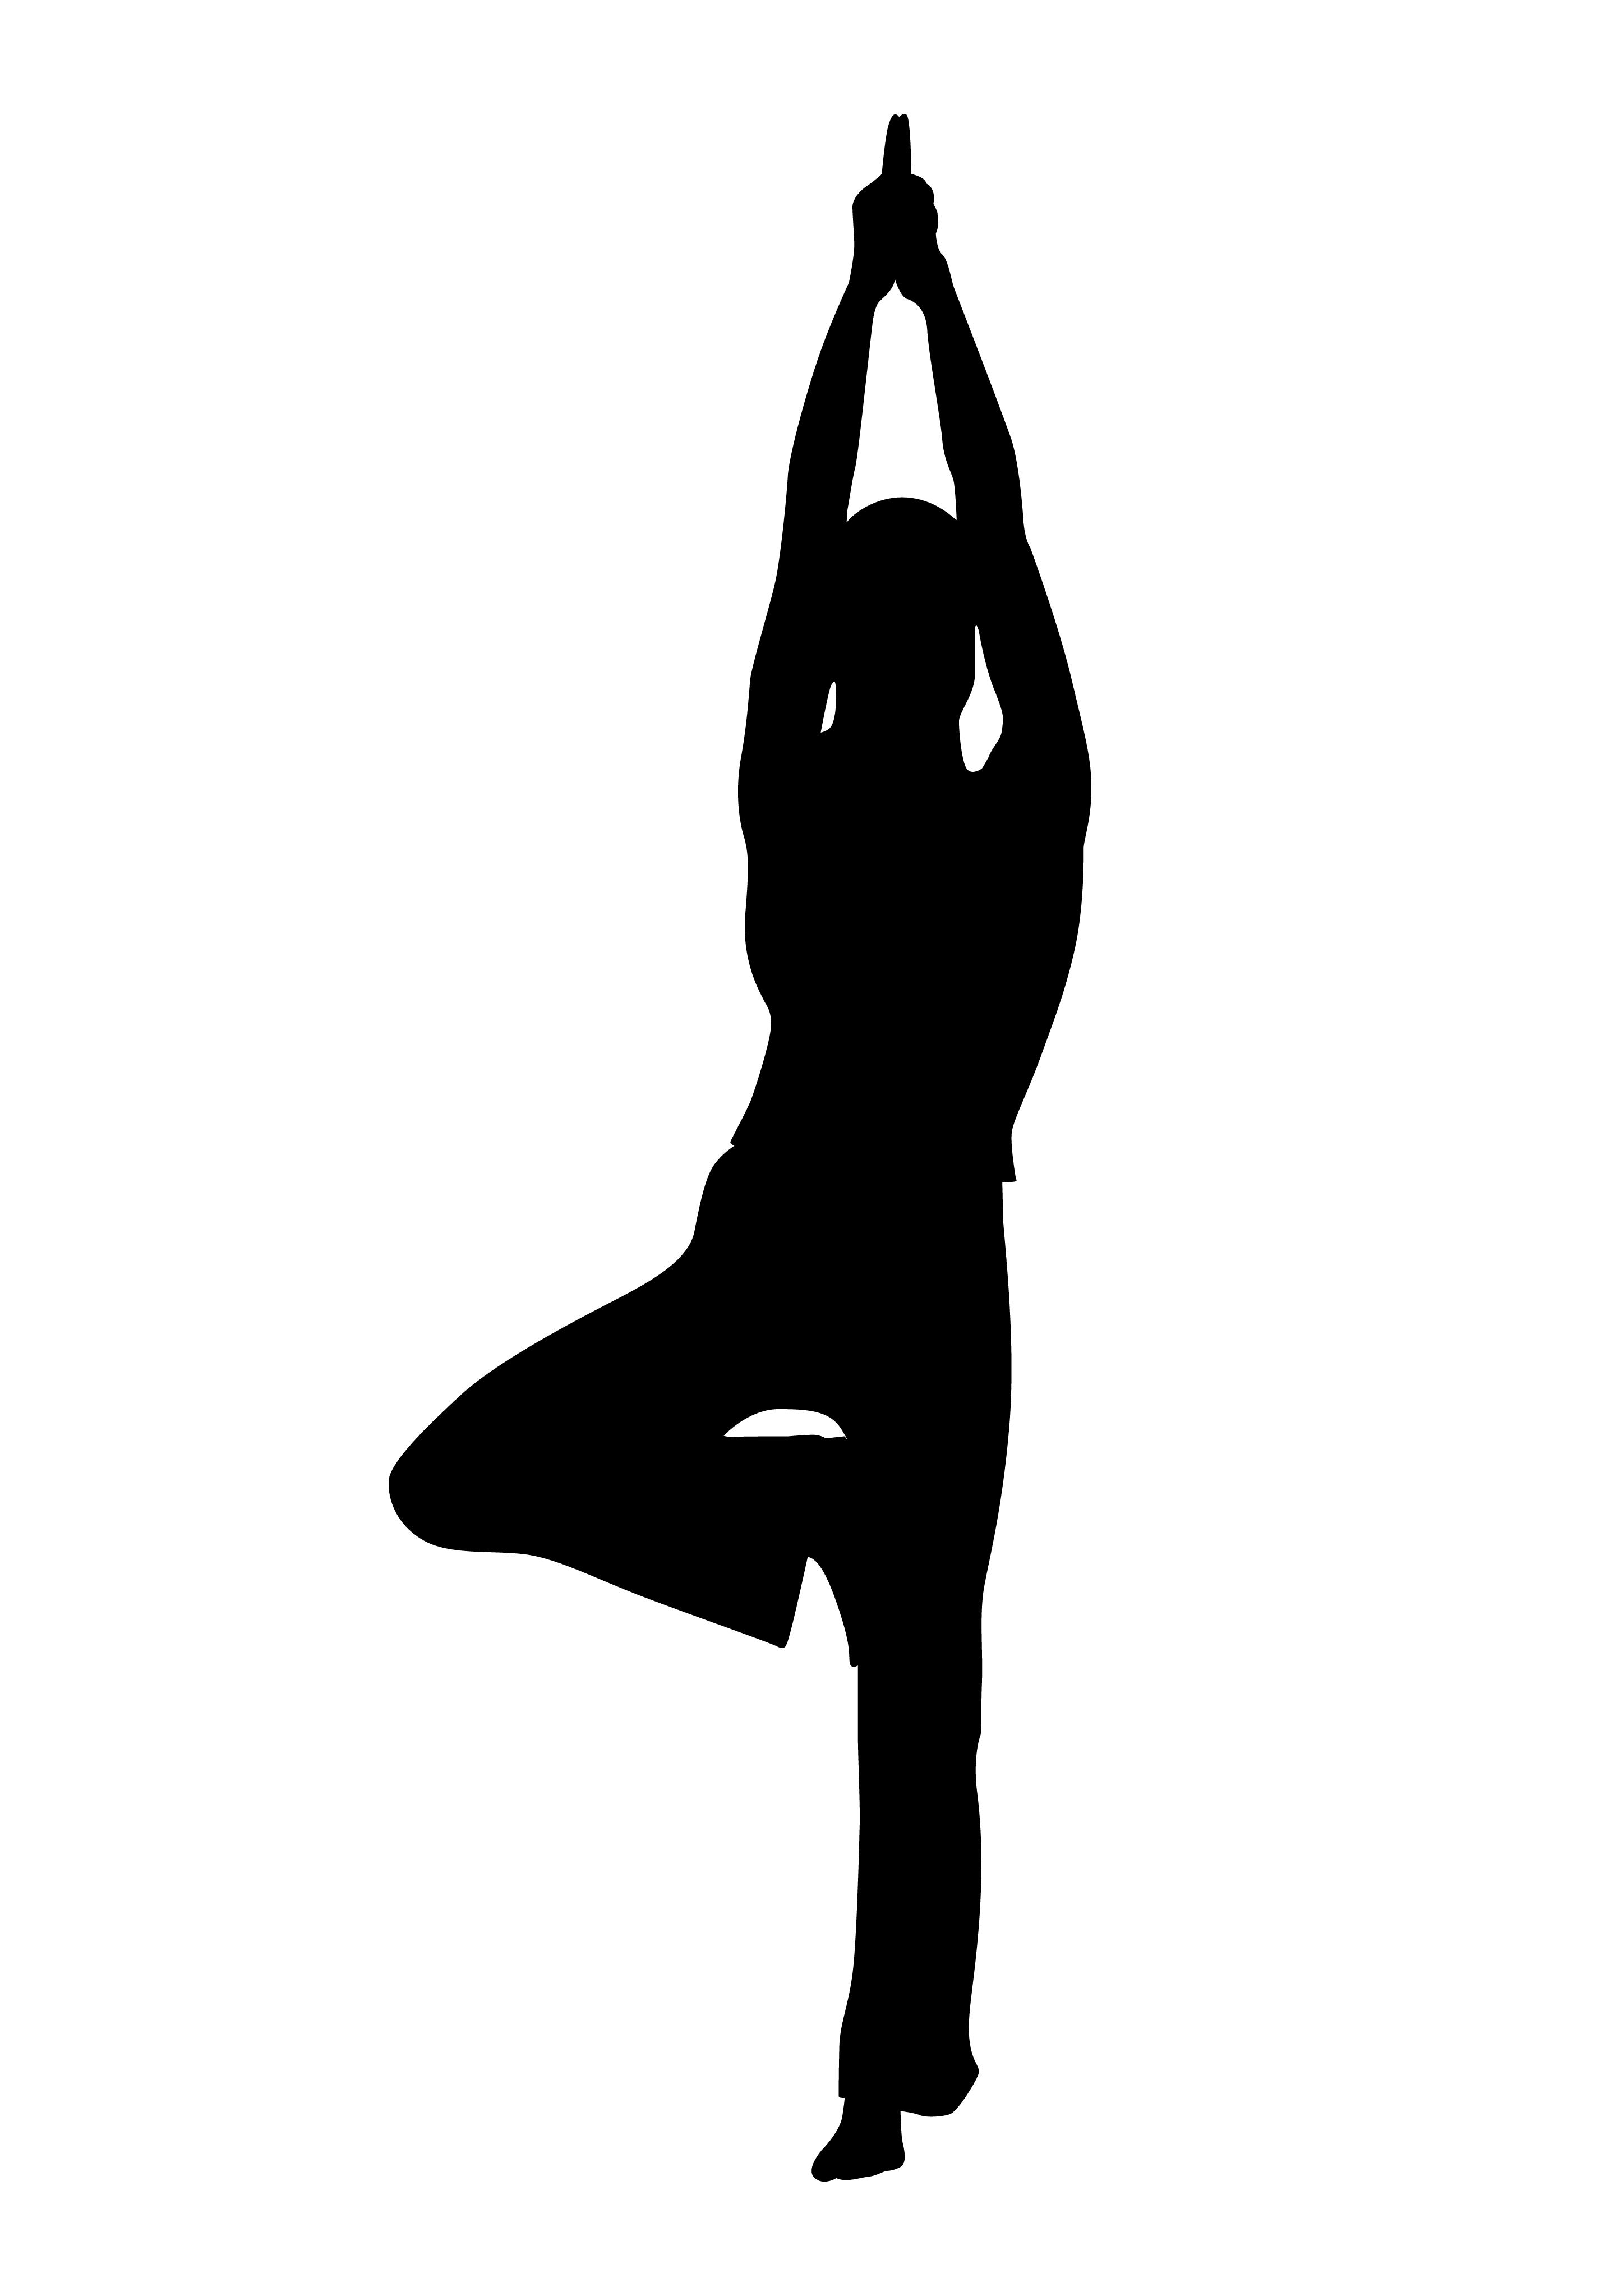 Yoga tree pose clipart.